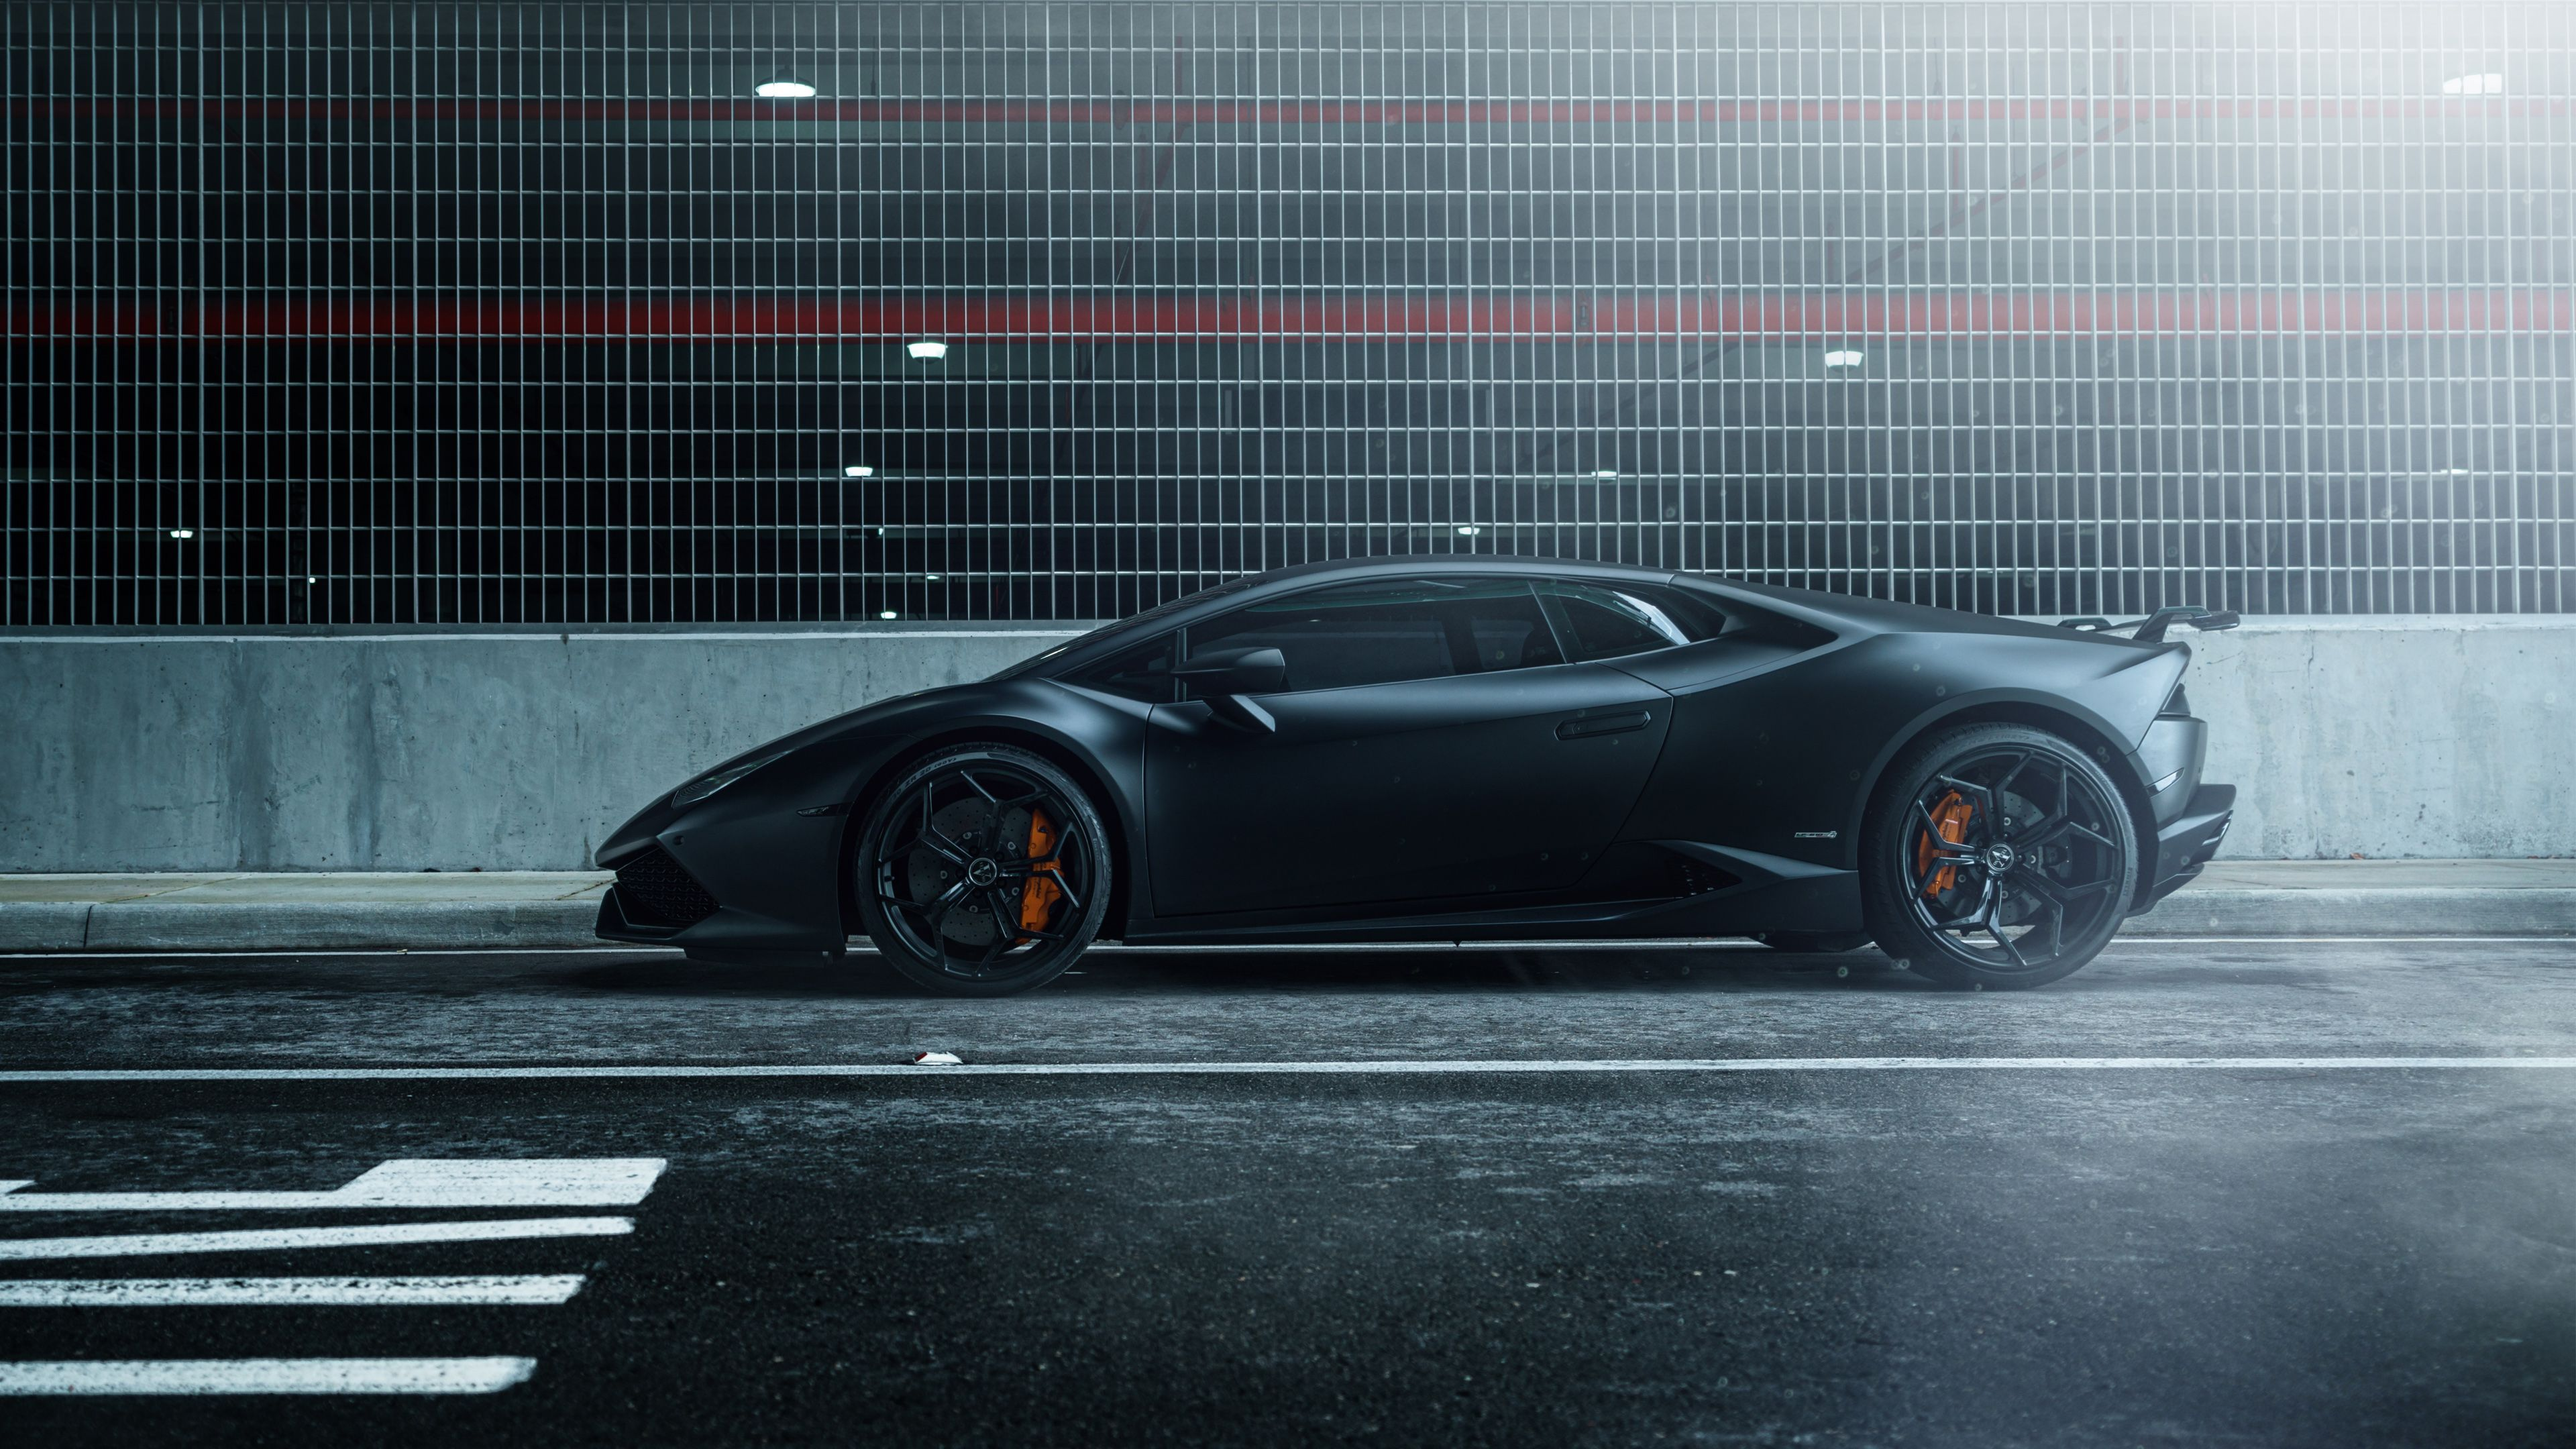 Lamborghini Huracan Wallpapers Full Hd Vehicles Wallpapers 3840x2160